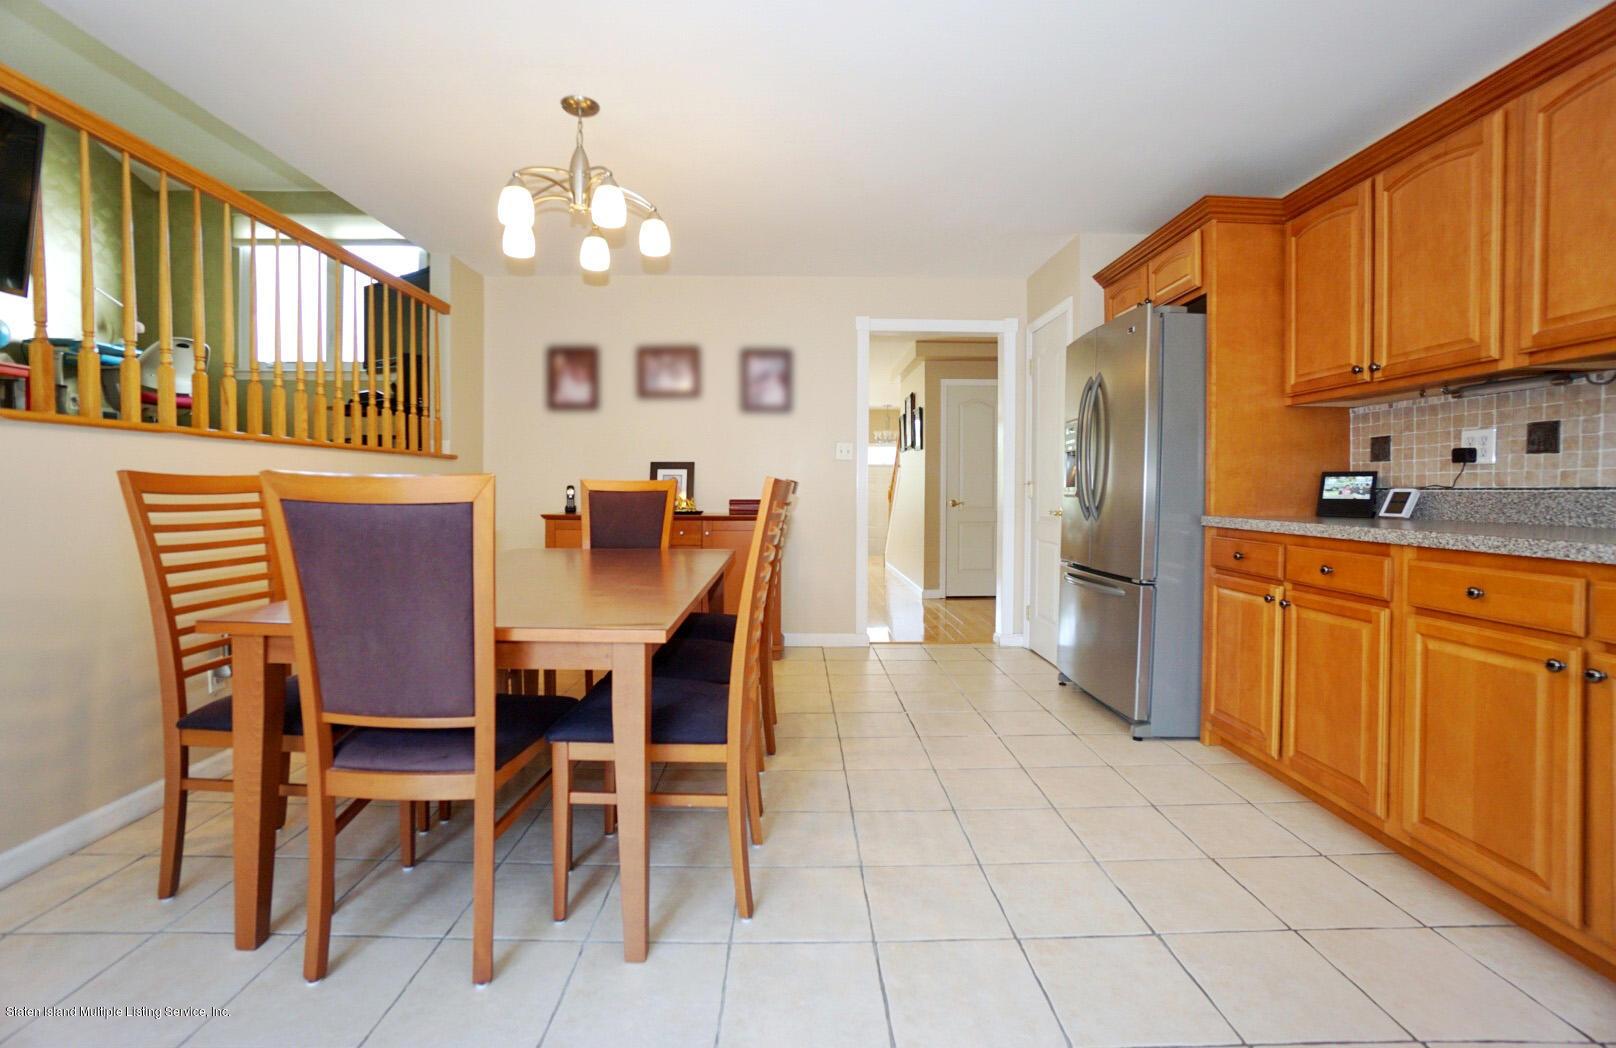 Single Family - Semi-Attached 18 Dunhill Lane  Staten Island, NY 10309, MLS-1139055-13